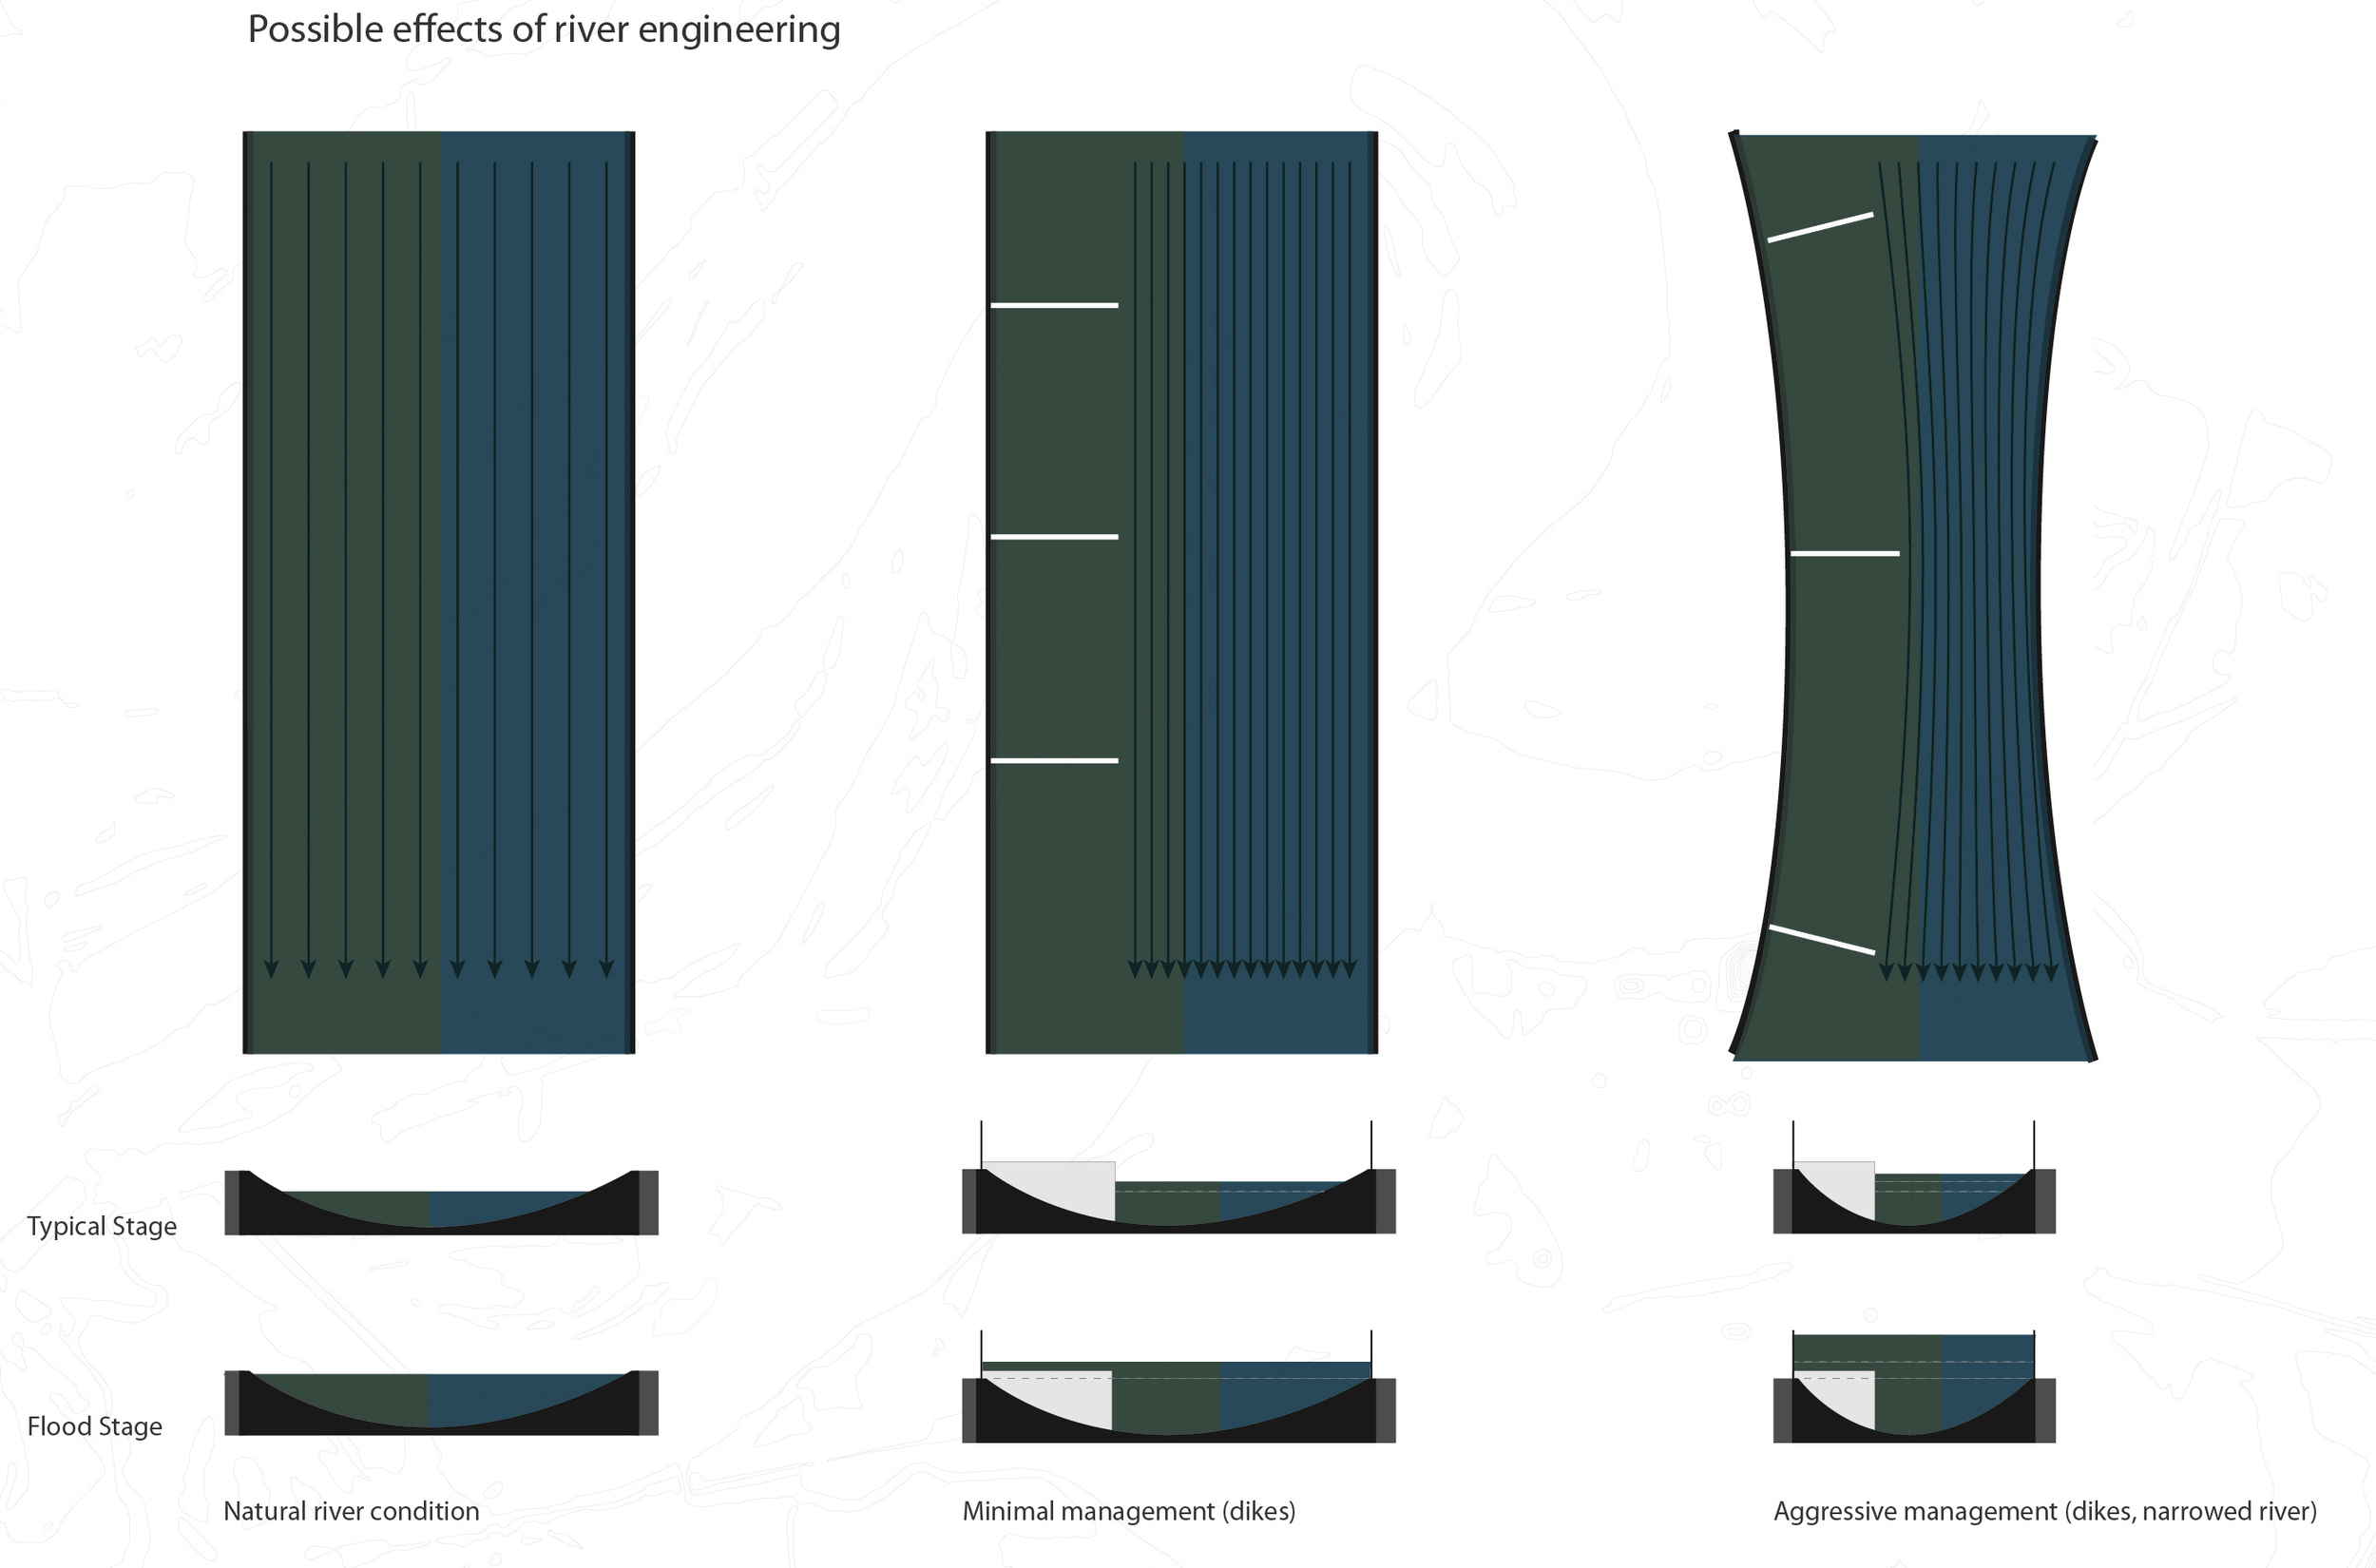 06_Sediment_Pucks_Tiffin_Thompson_Effects_of_River_Engineering.jpg